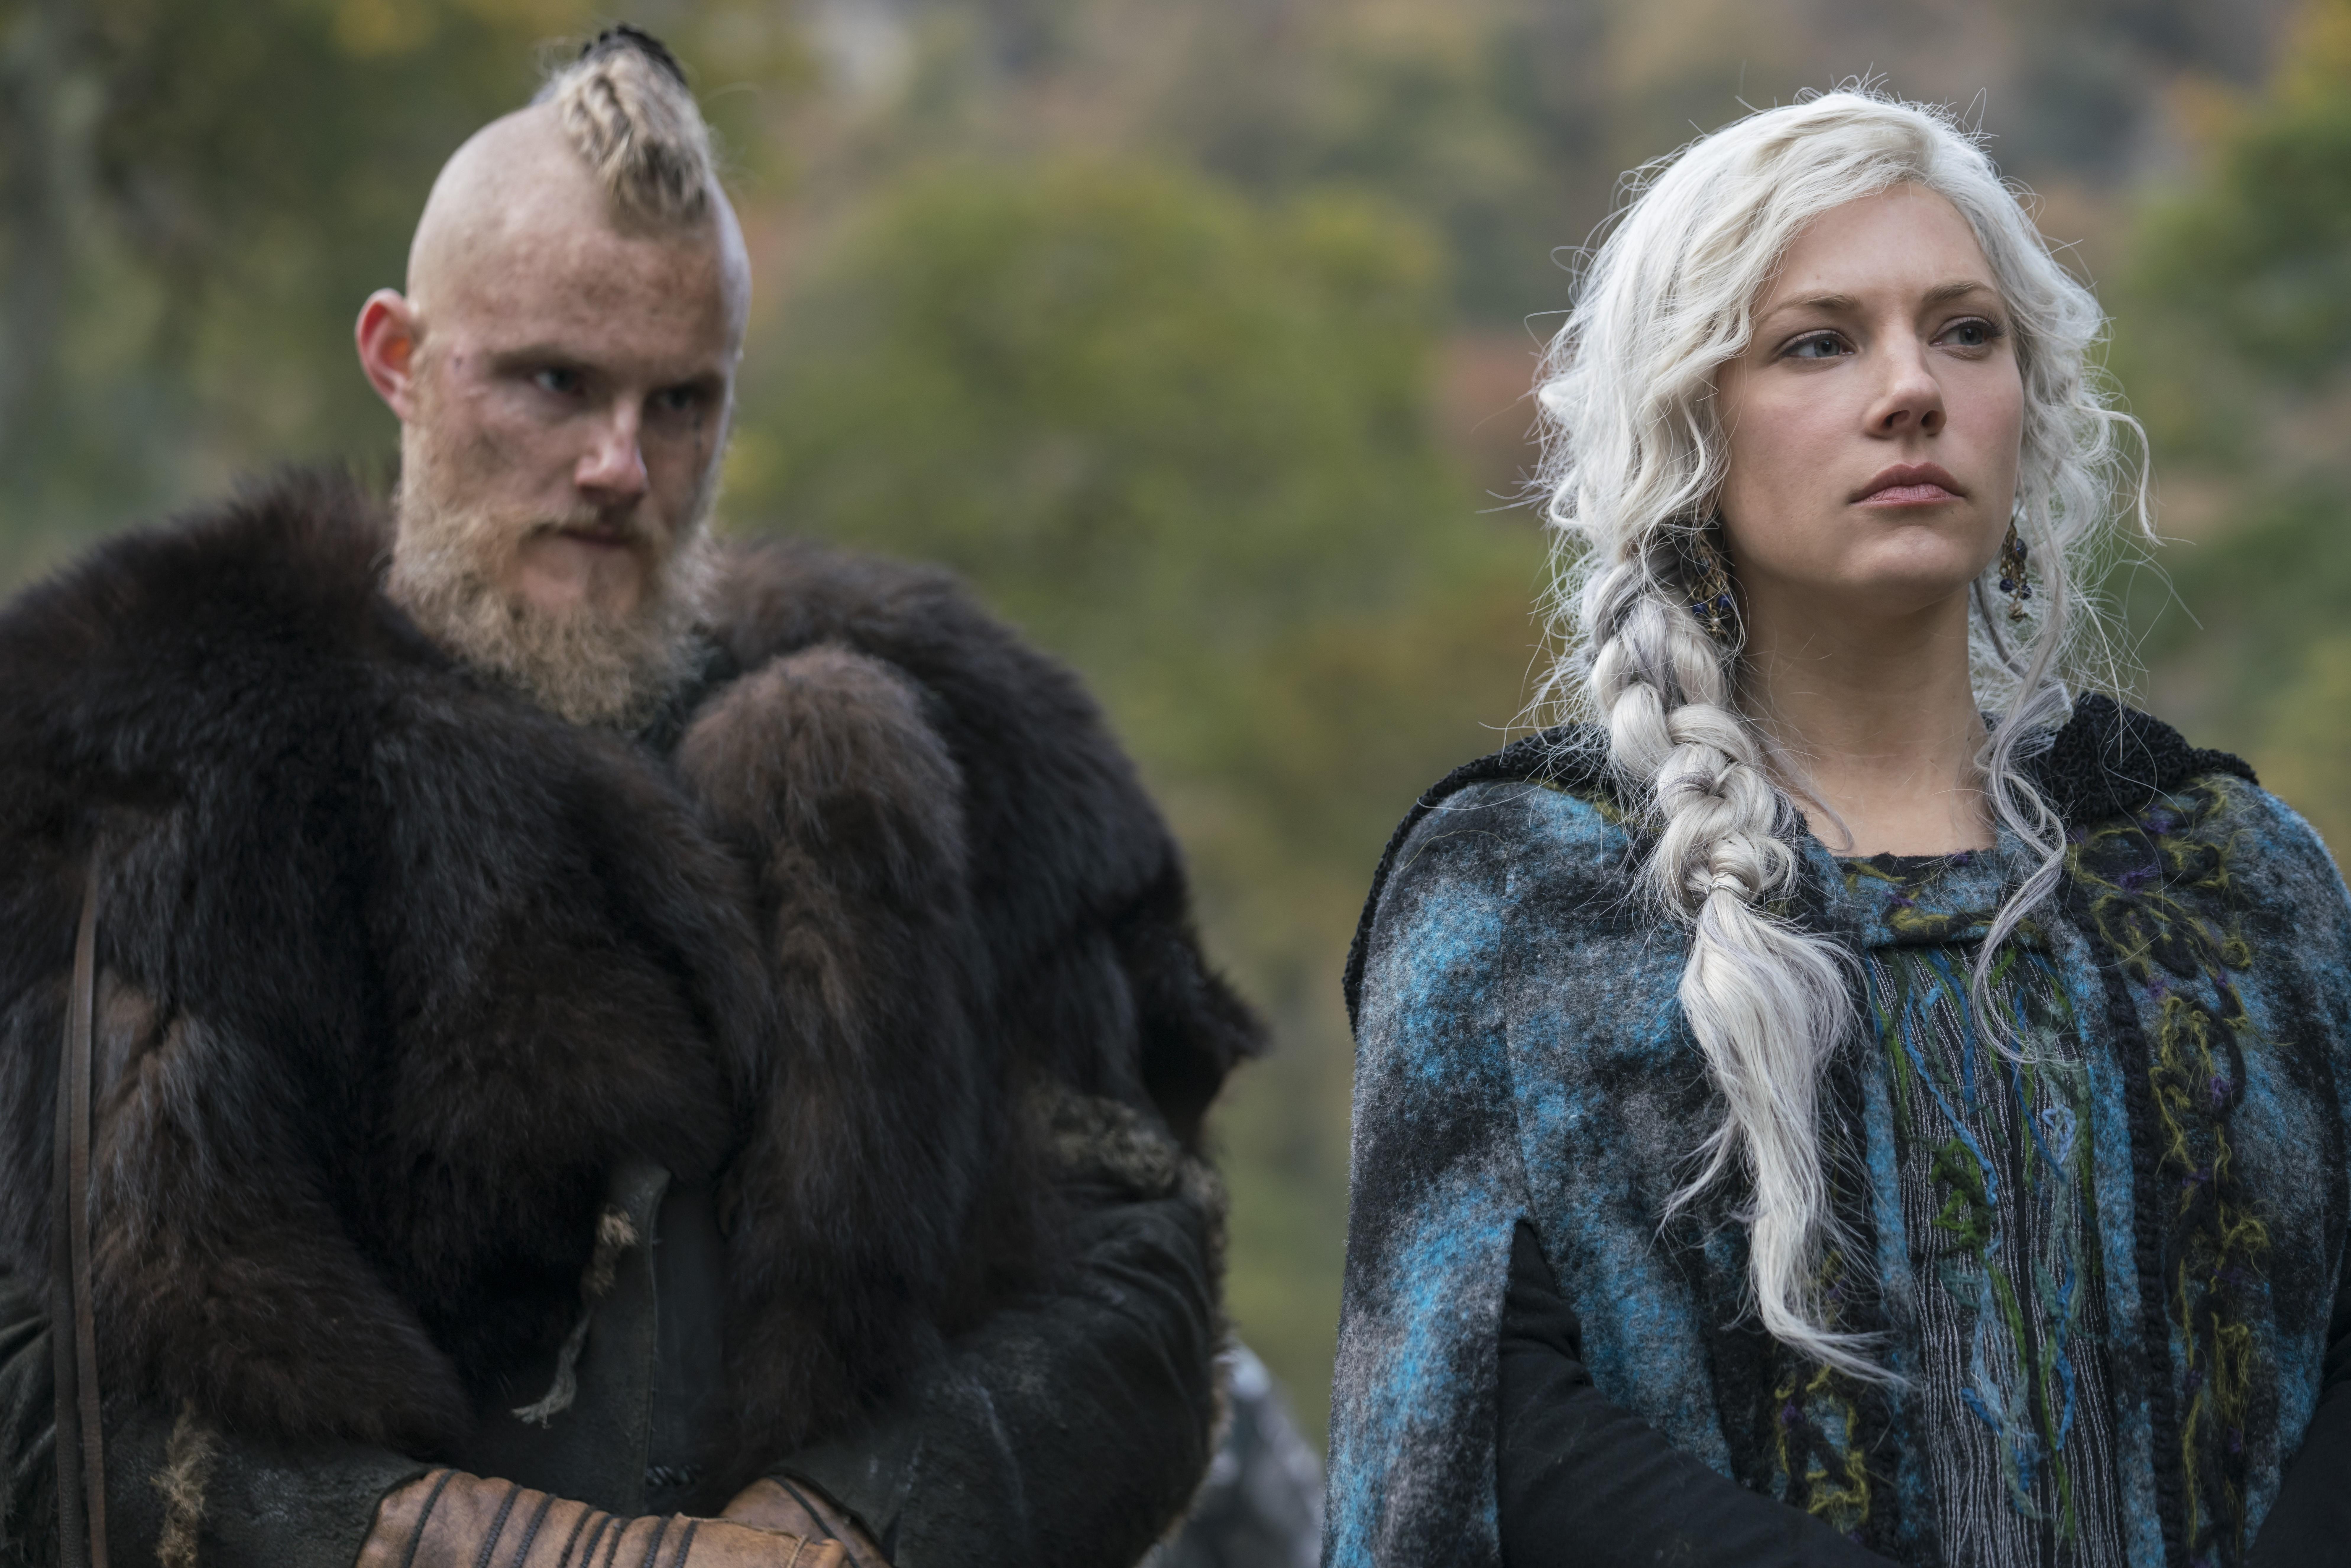 Vikings season 6 could debut sooner than you think